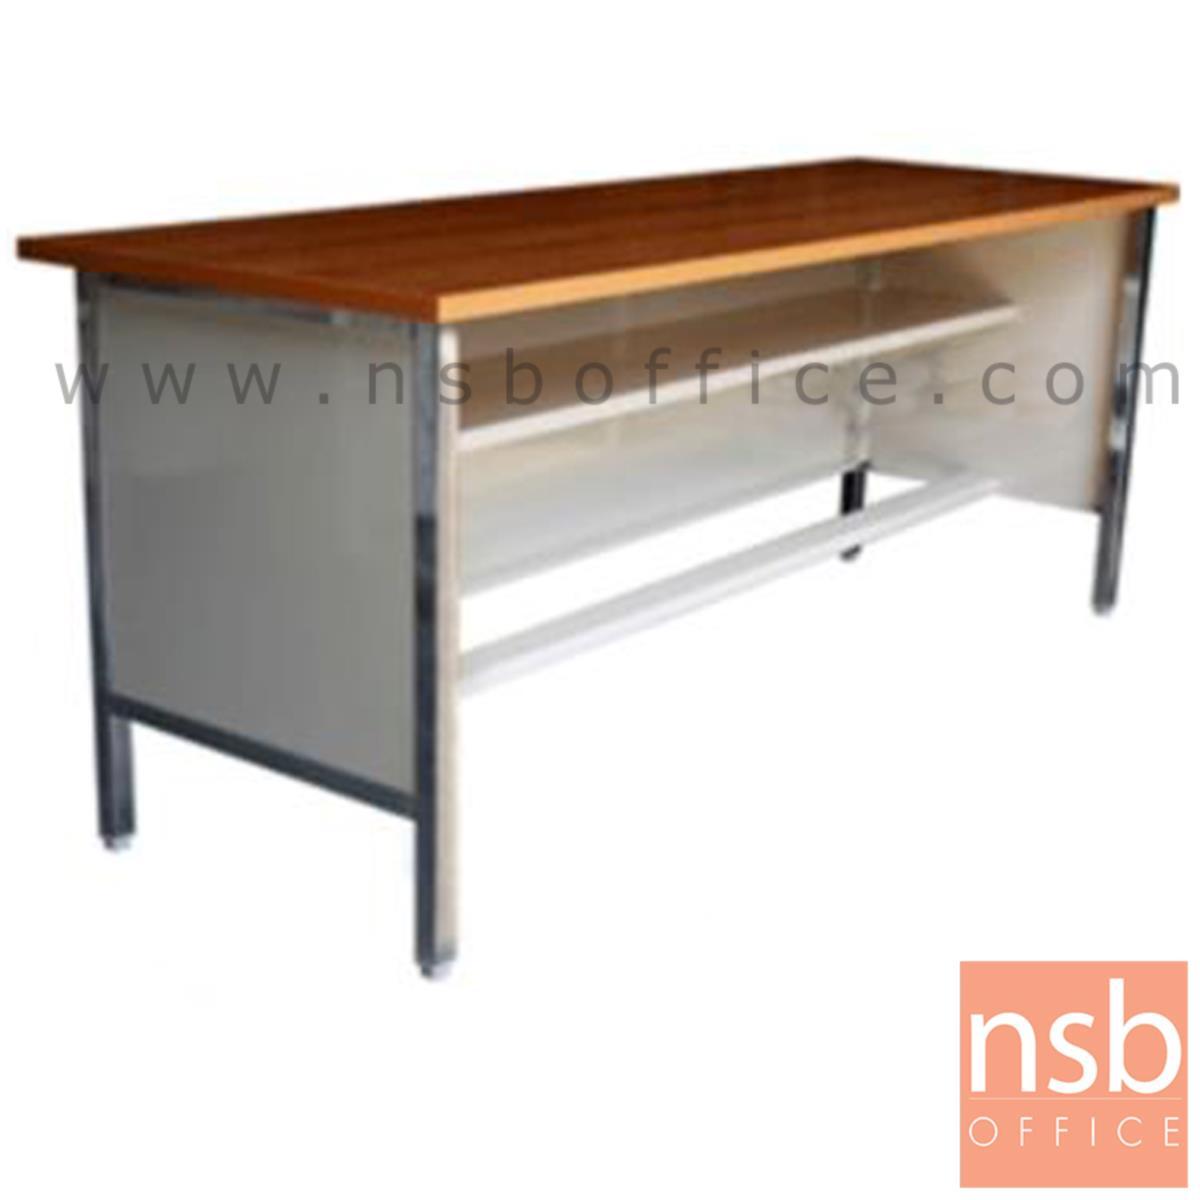 A05A062:โต๊ะประชุมตรง รุ่น Maeby (เมบี) ขนาด 119.7W ,152.5W ,182.5W cm. ขาเหล็ก 4 ขามีปุ่มปรับระดับ